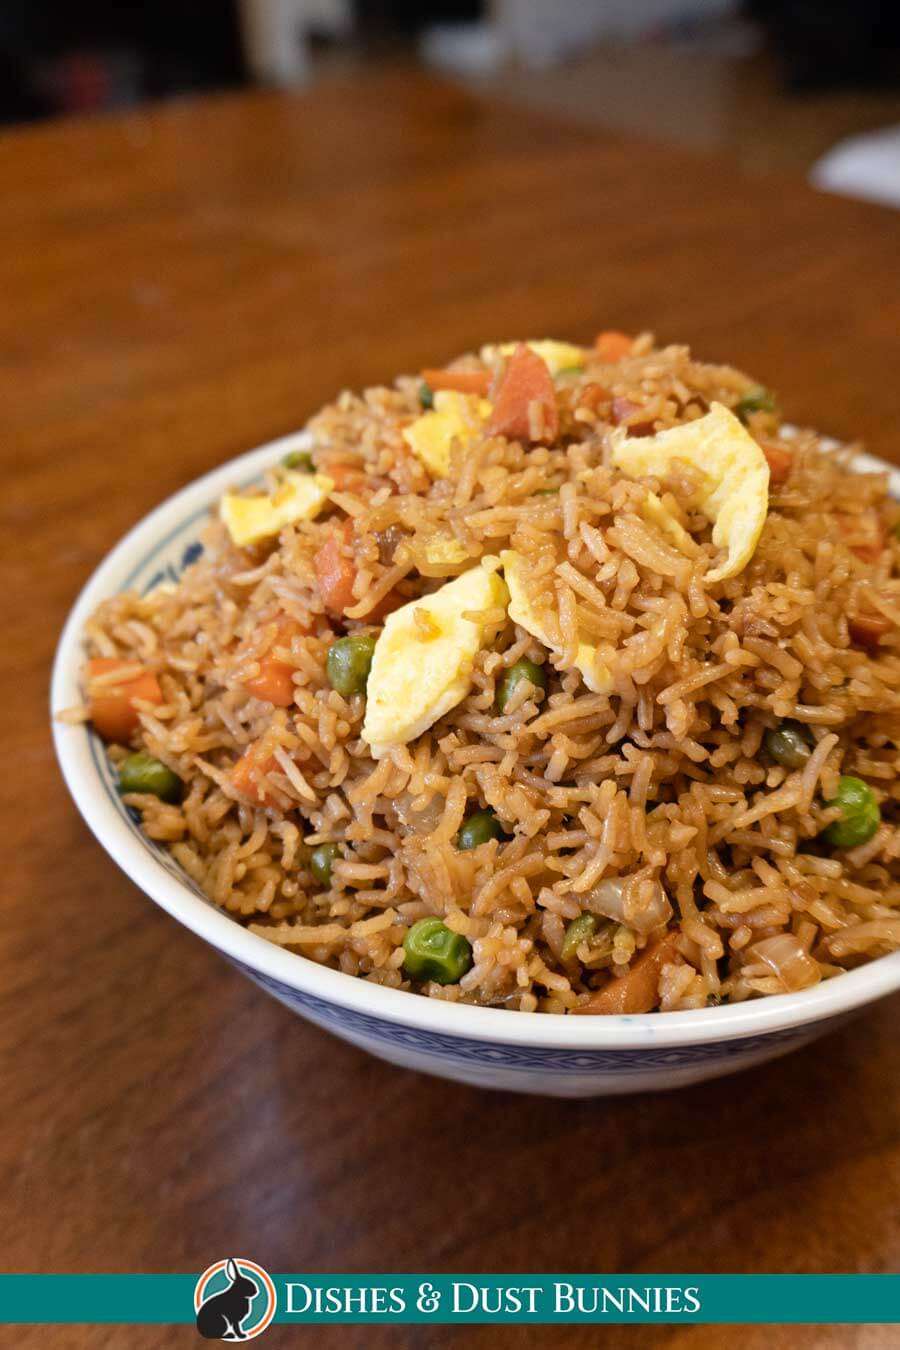 How to Make Basic Fried Rice